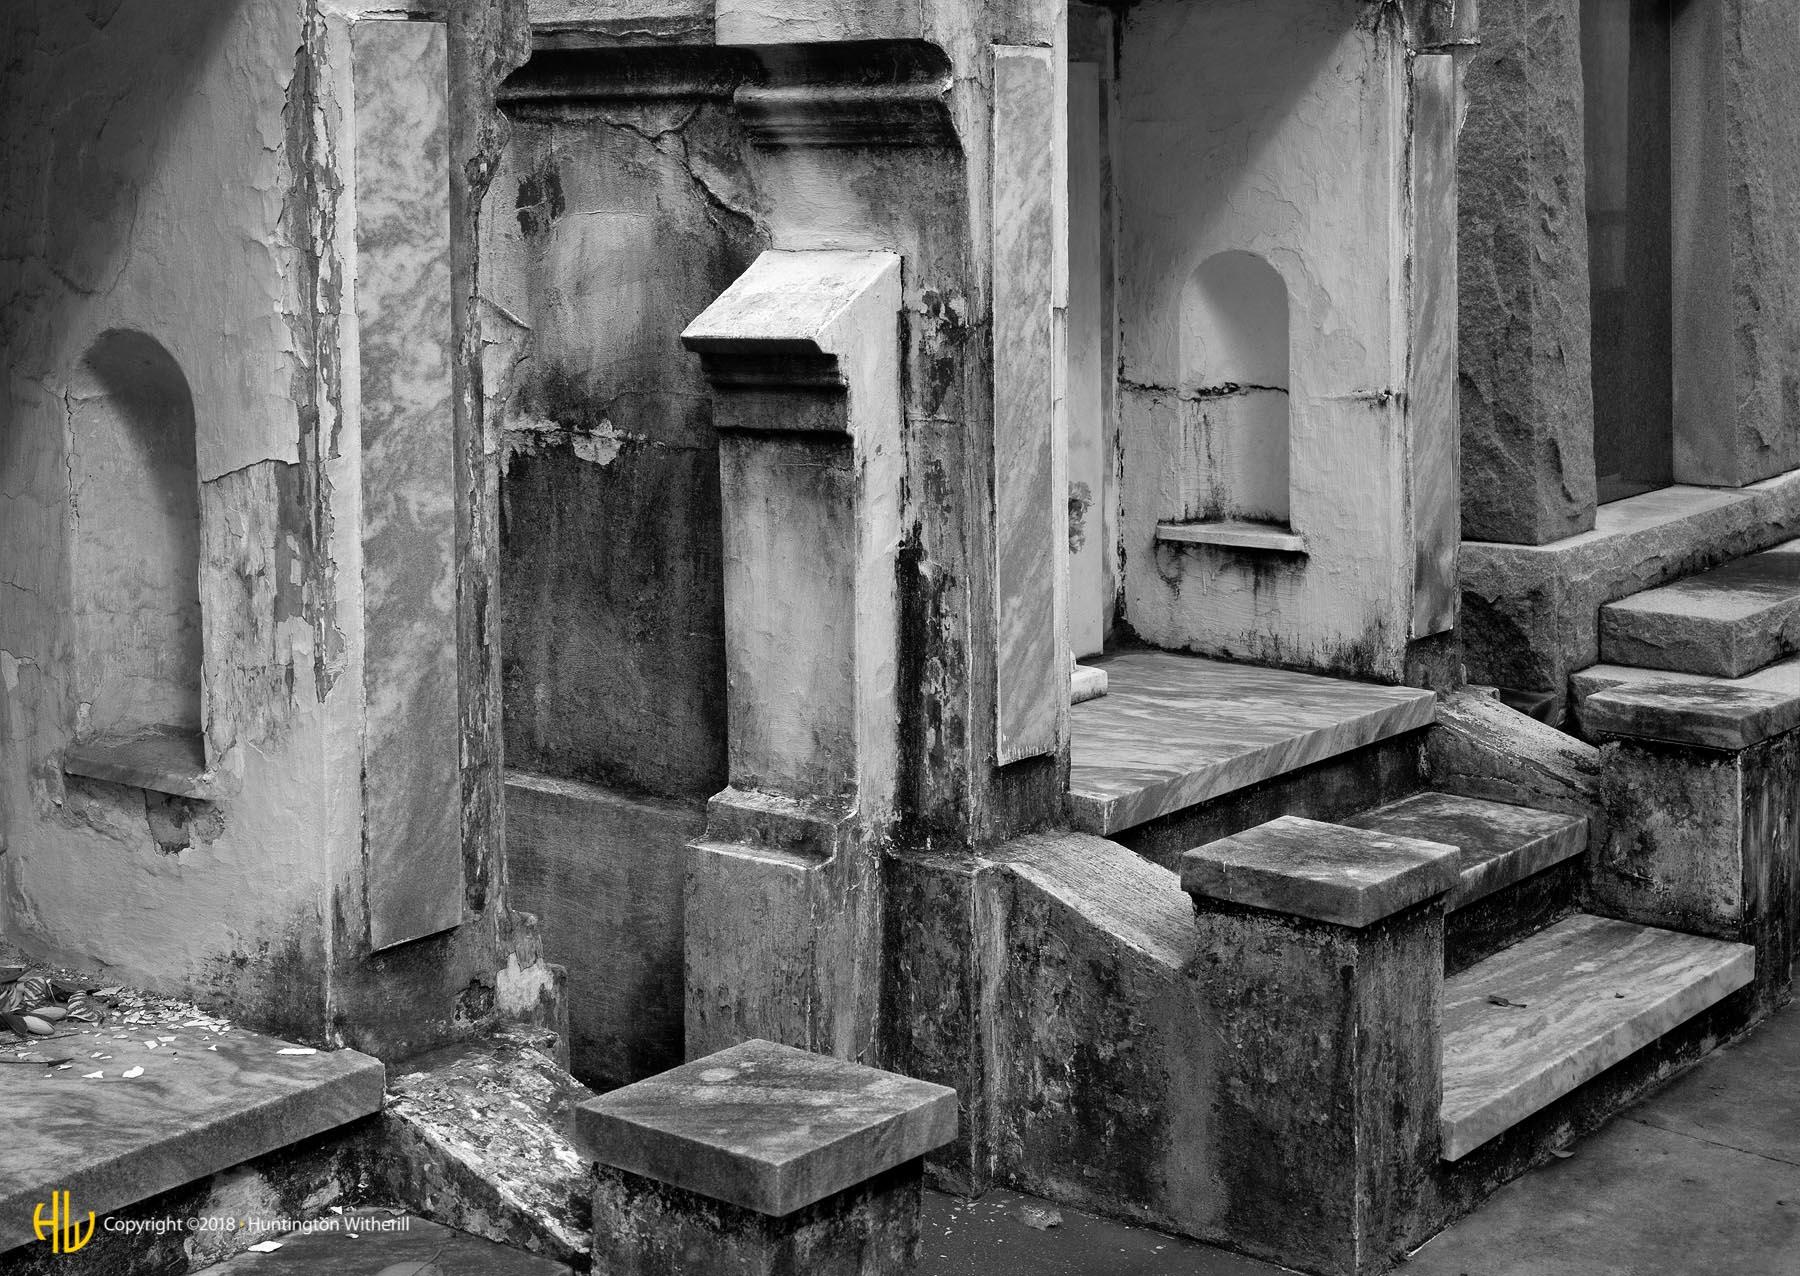 Cemetery #2, New Orleans, LA, 1990